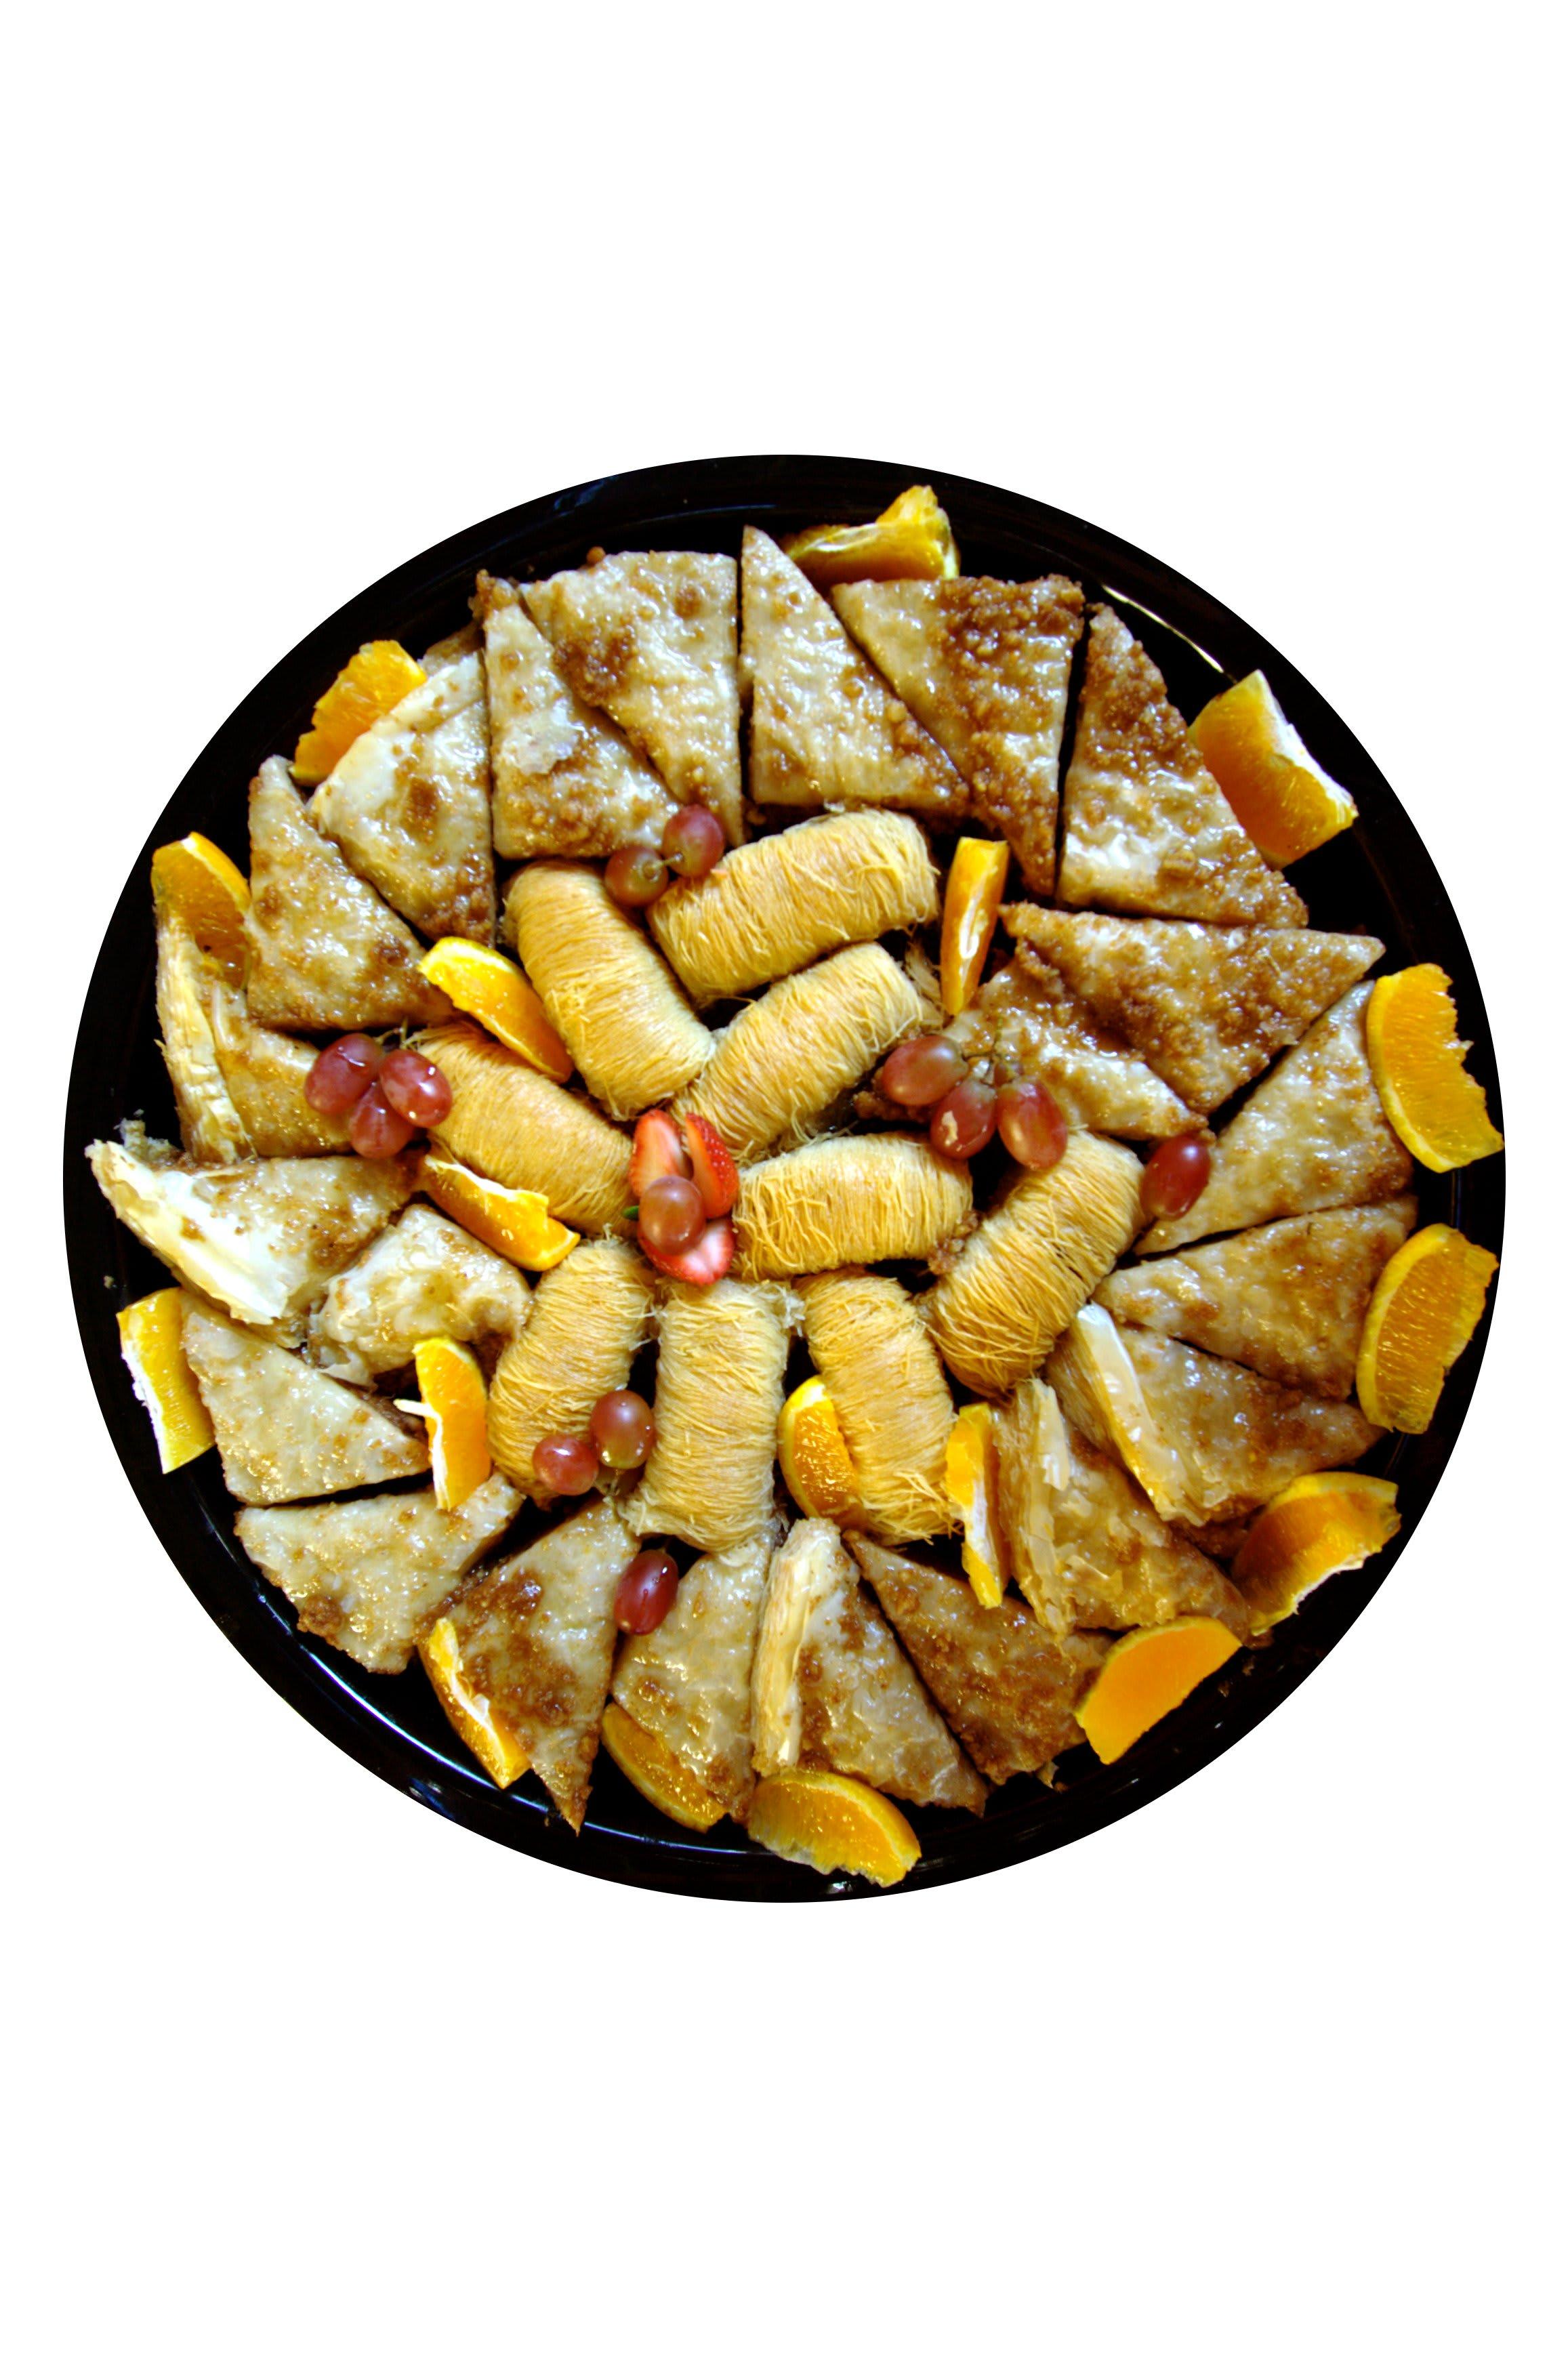 Dessert tray at Mediterranean Cafe